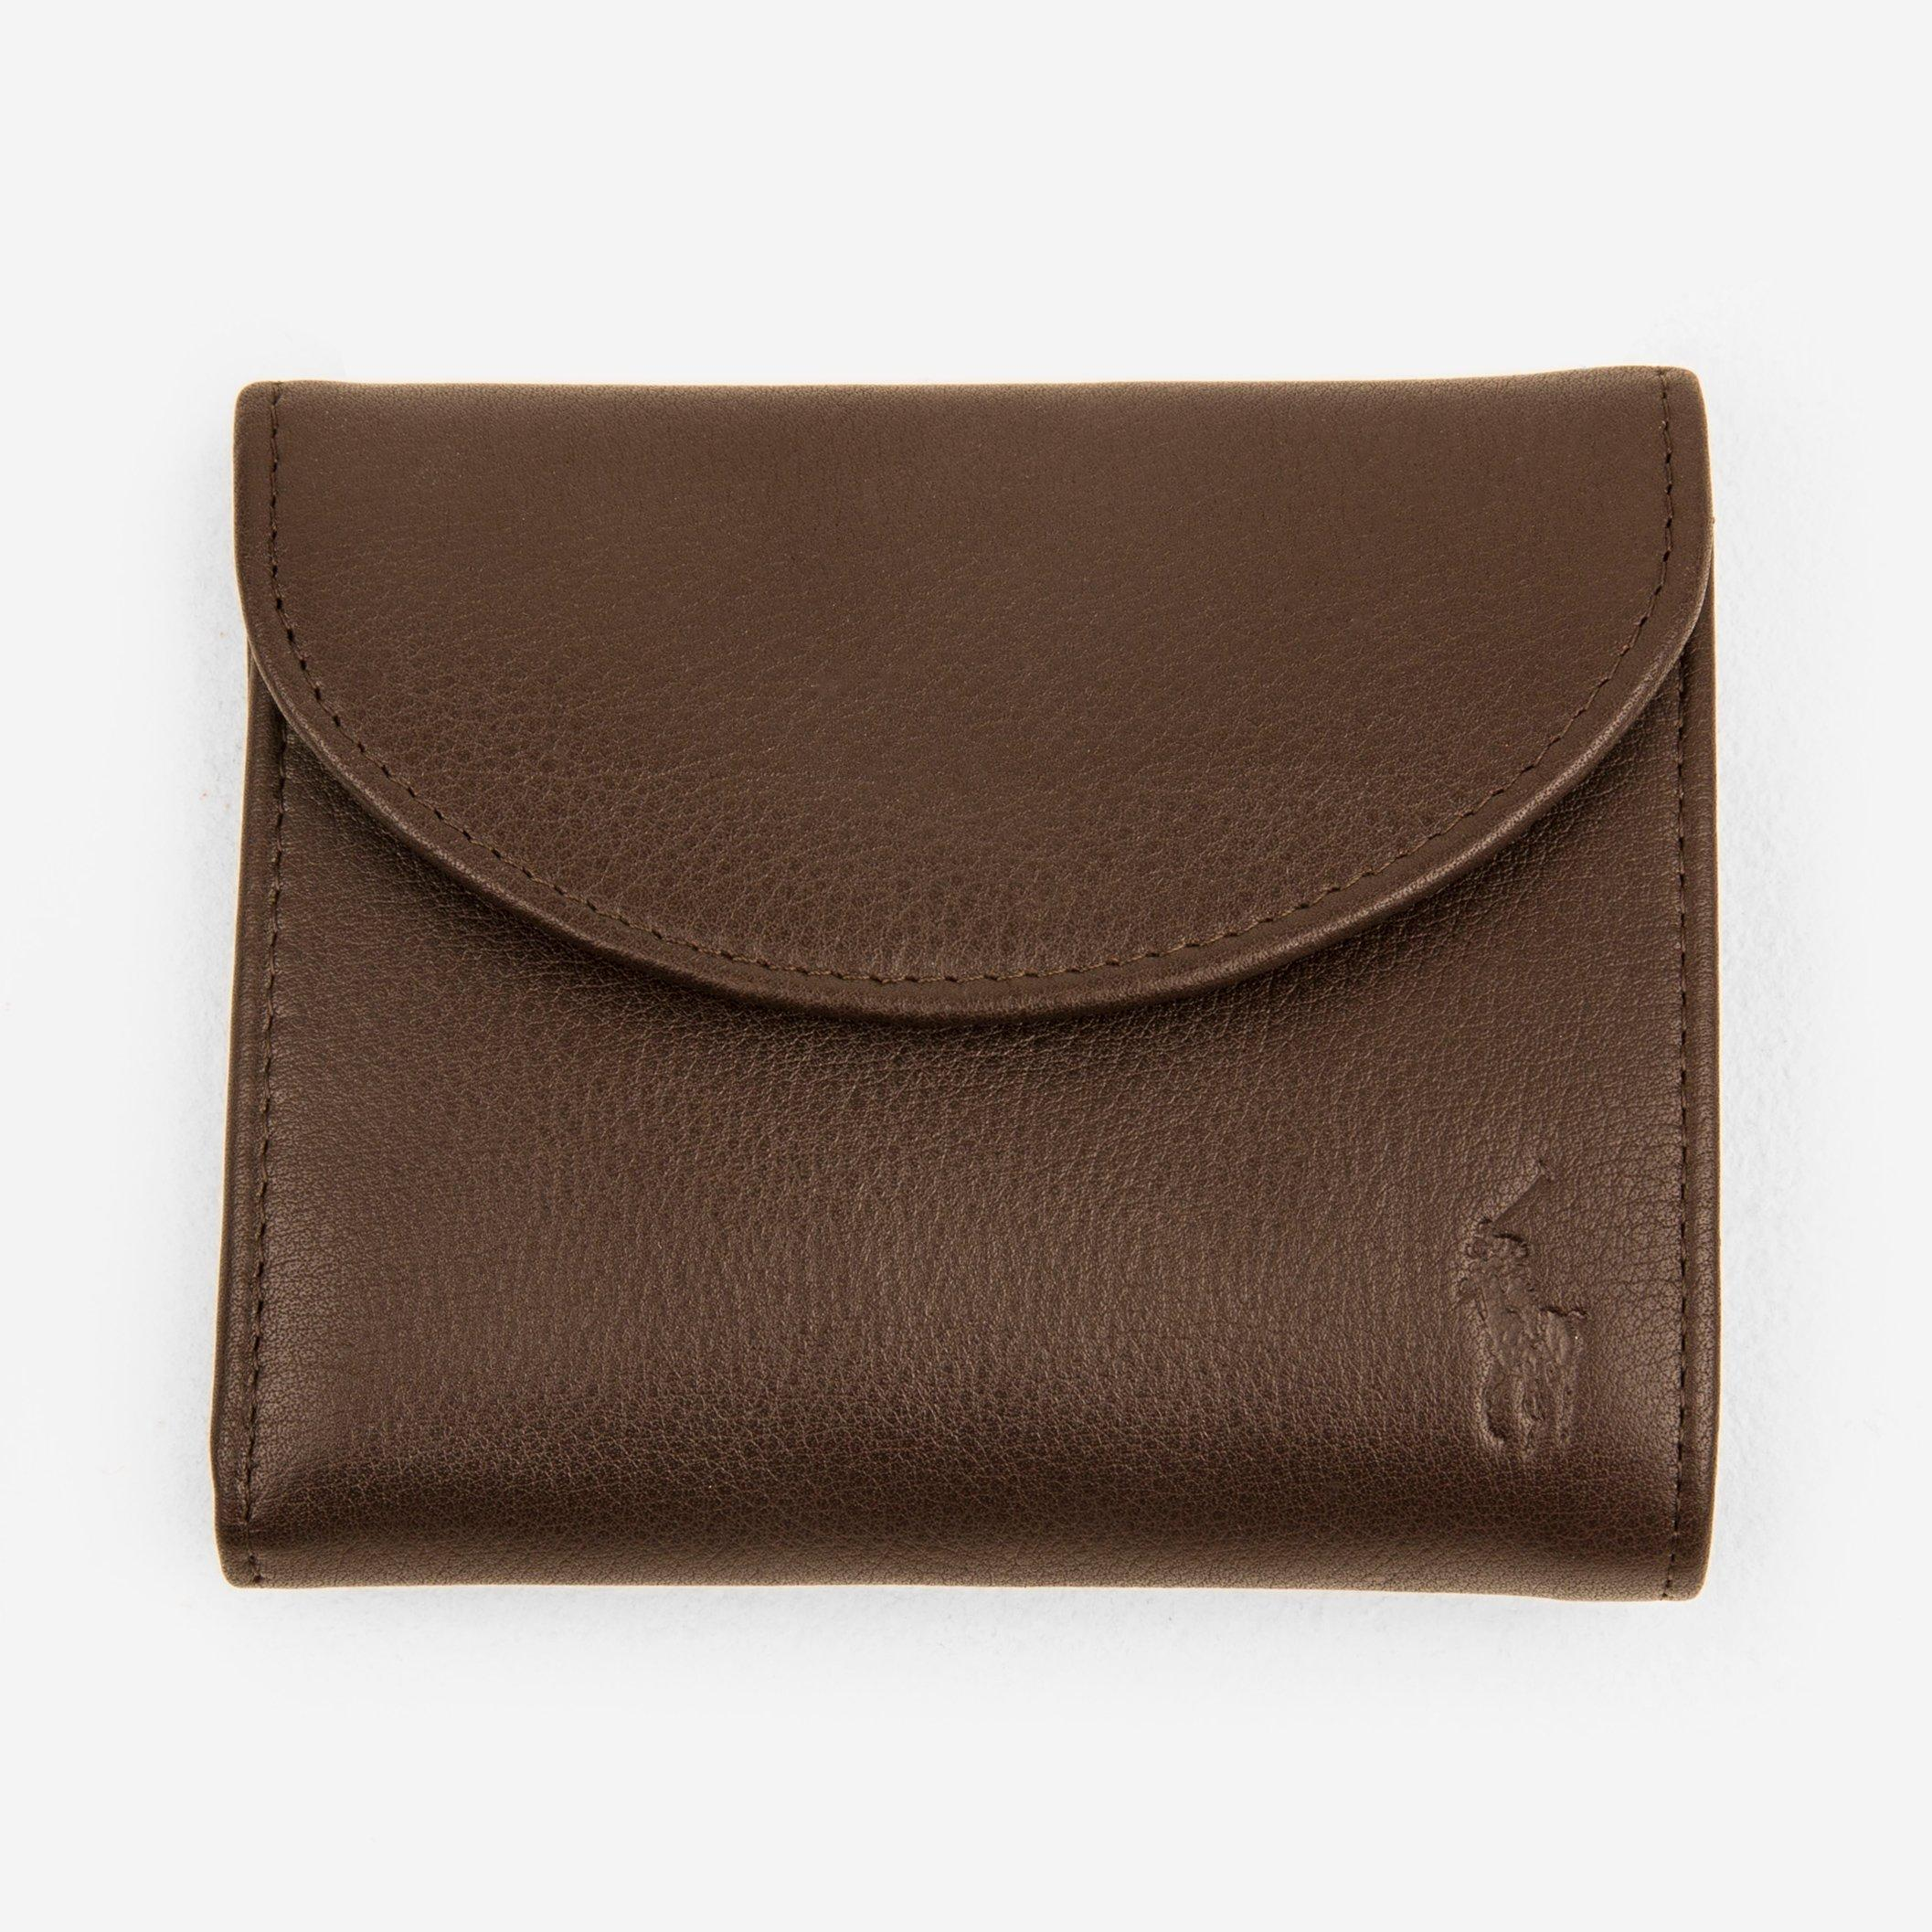 Polo Ralph Lauren Snap Wallet